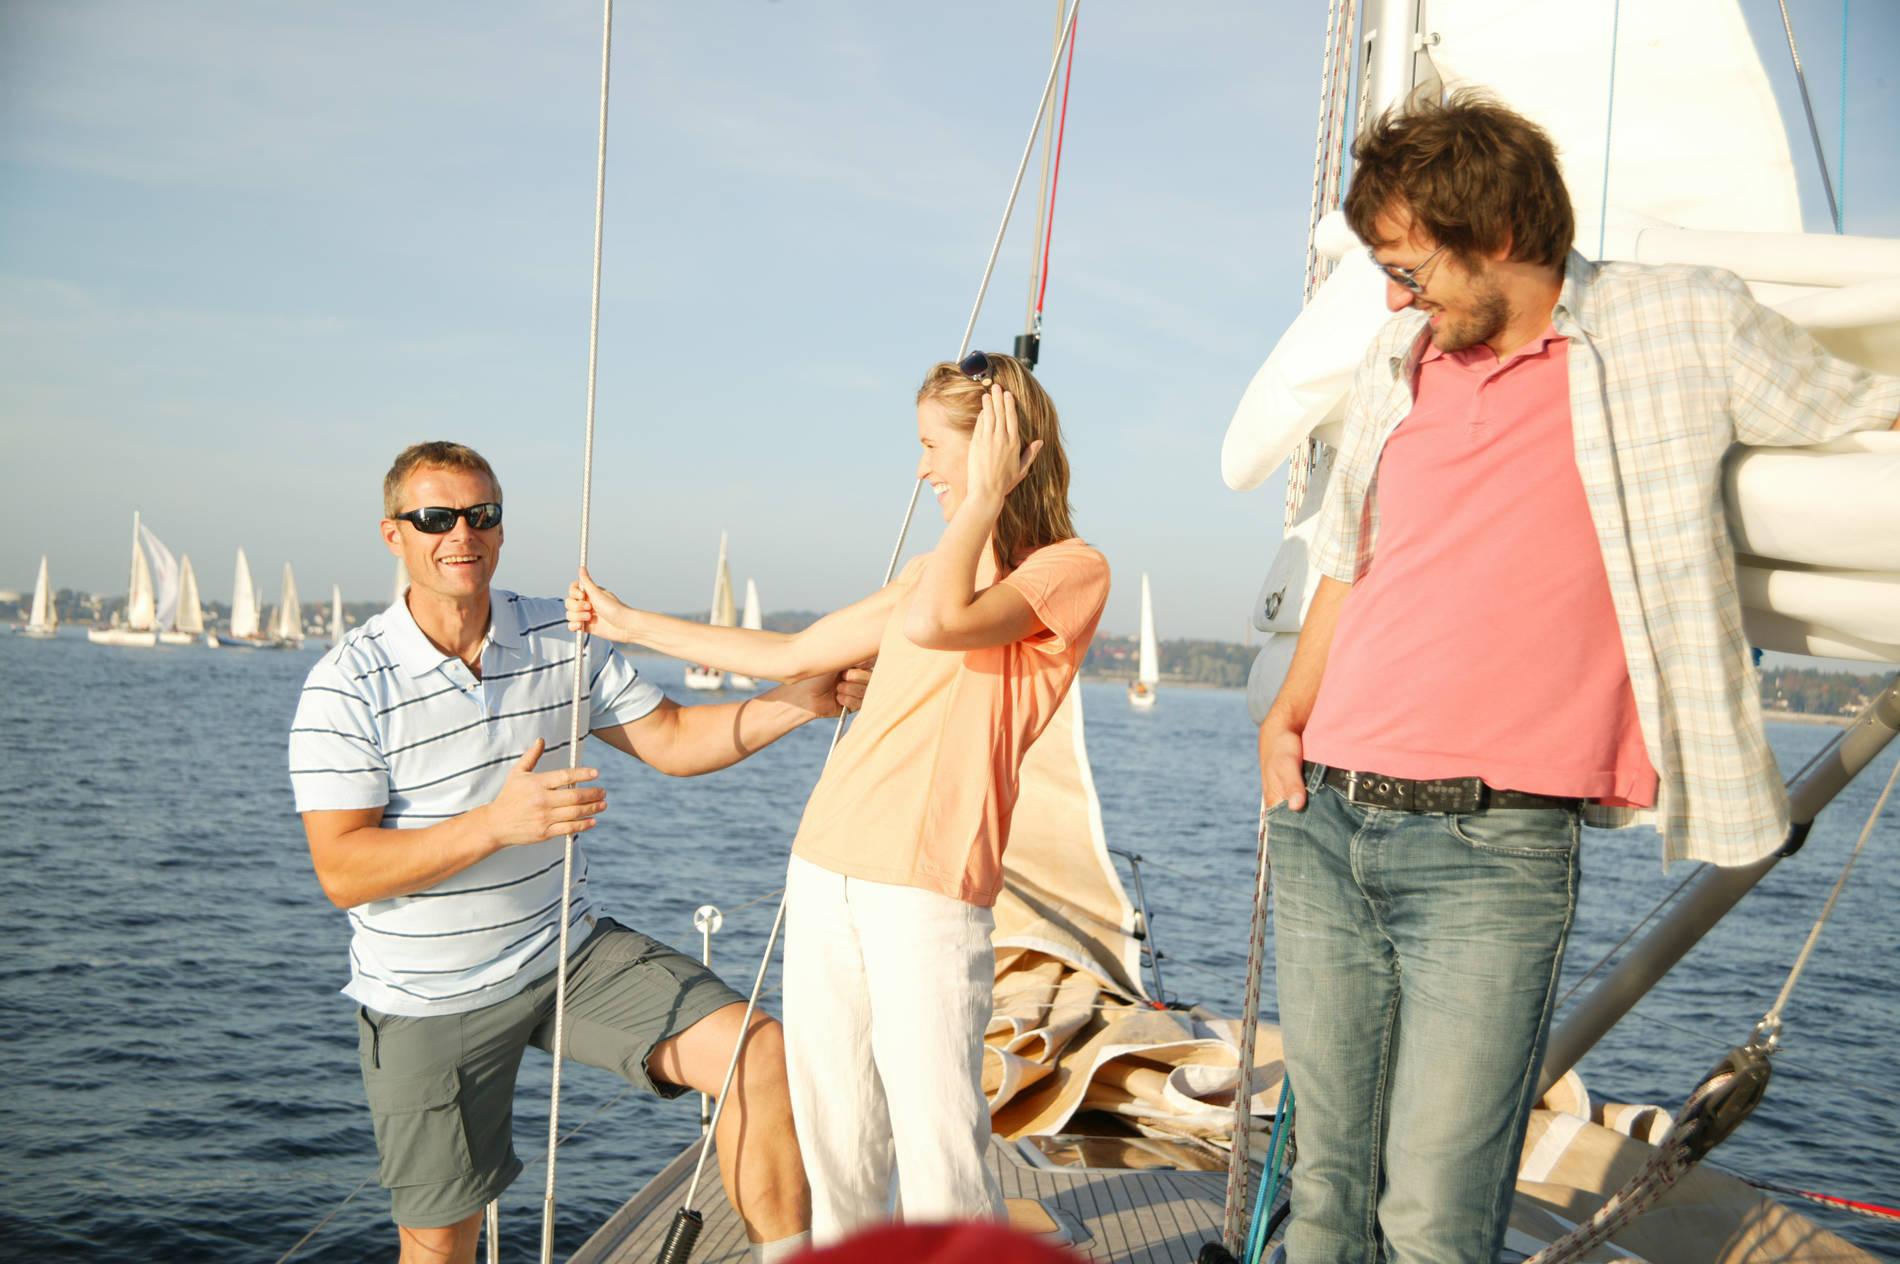 Sailing on the sea in Tallinn